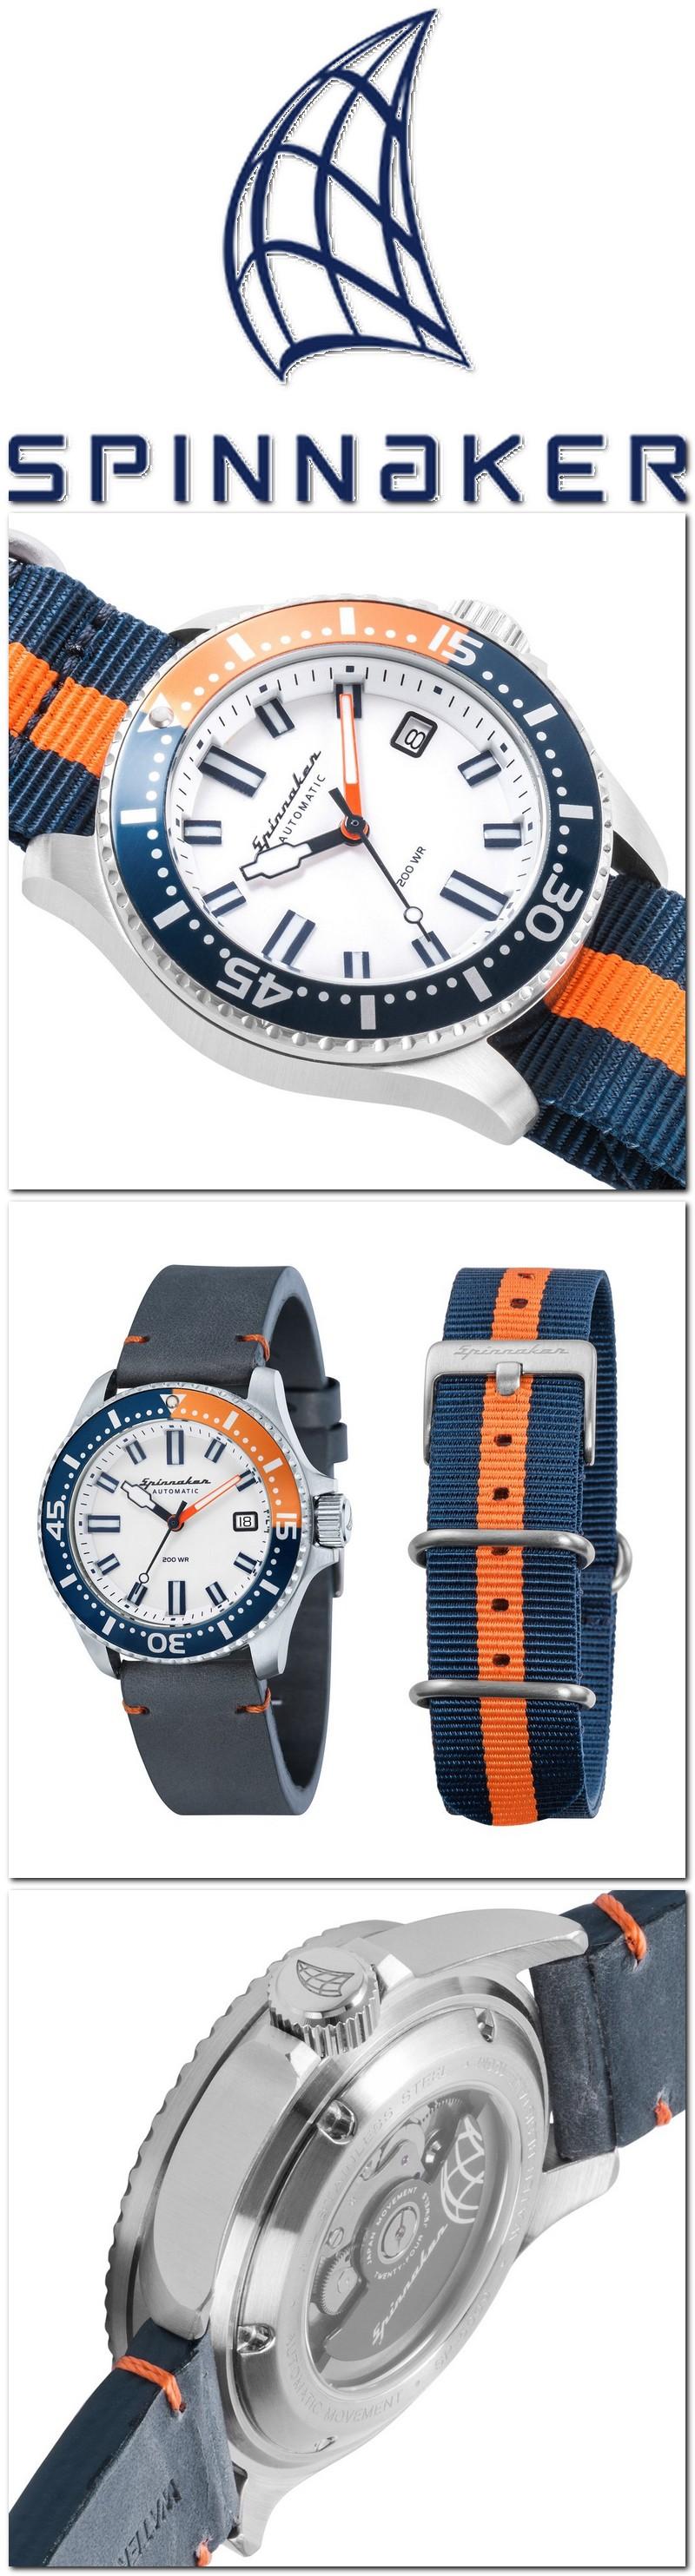 Les montres Spinnaker de Dartmouth Brands / Solar time limited – Hong Kong. 2018-012